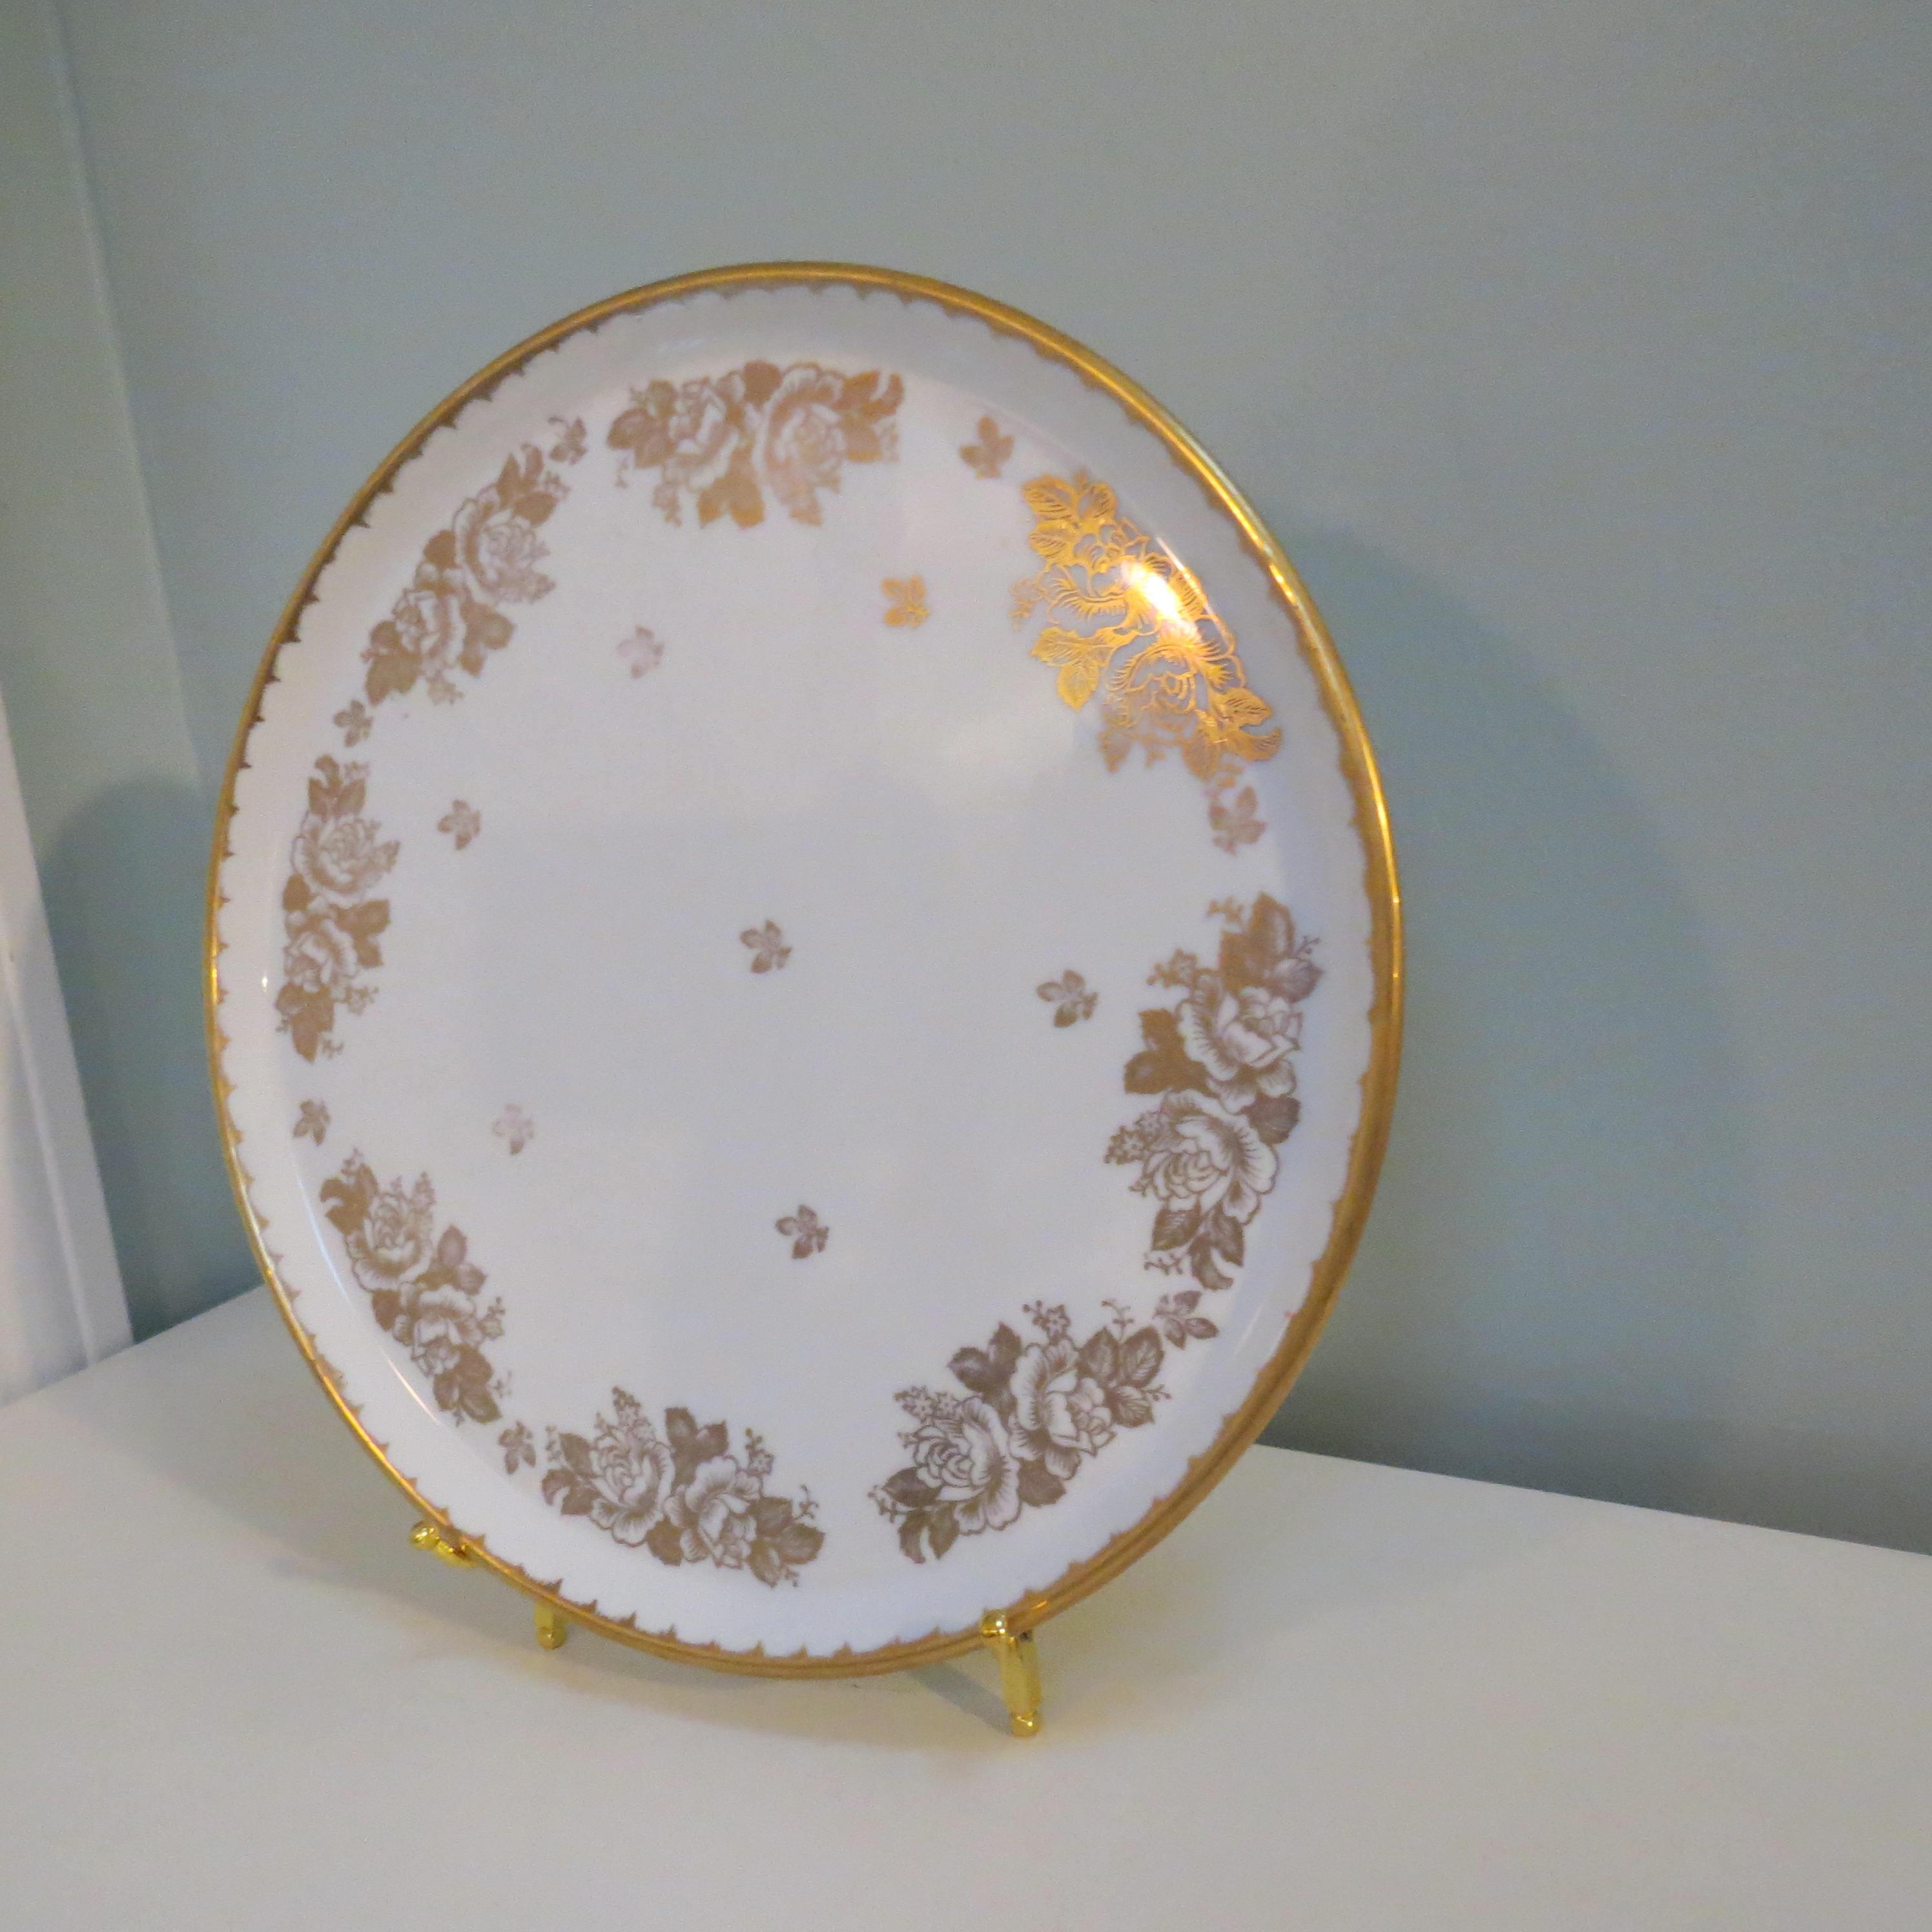 Image 2 of Antique Revol Porcelain China Plate